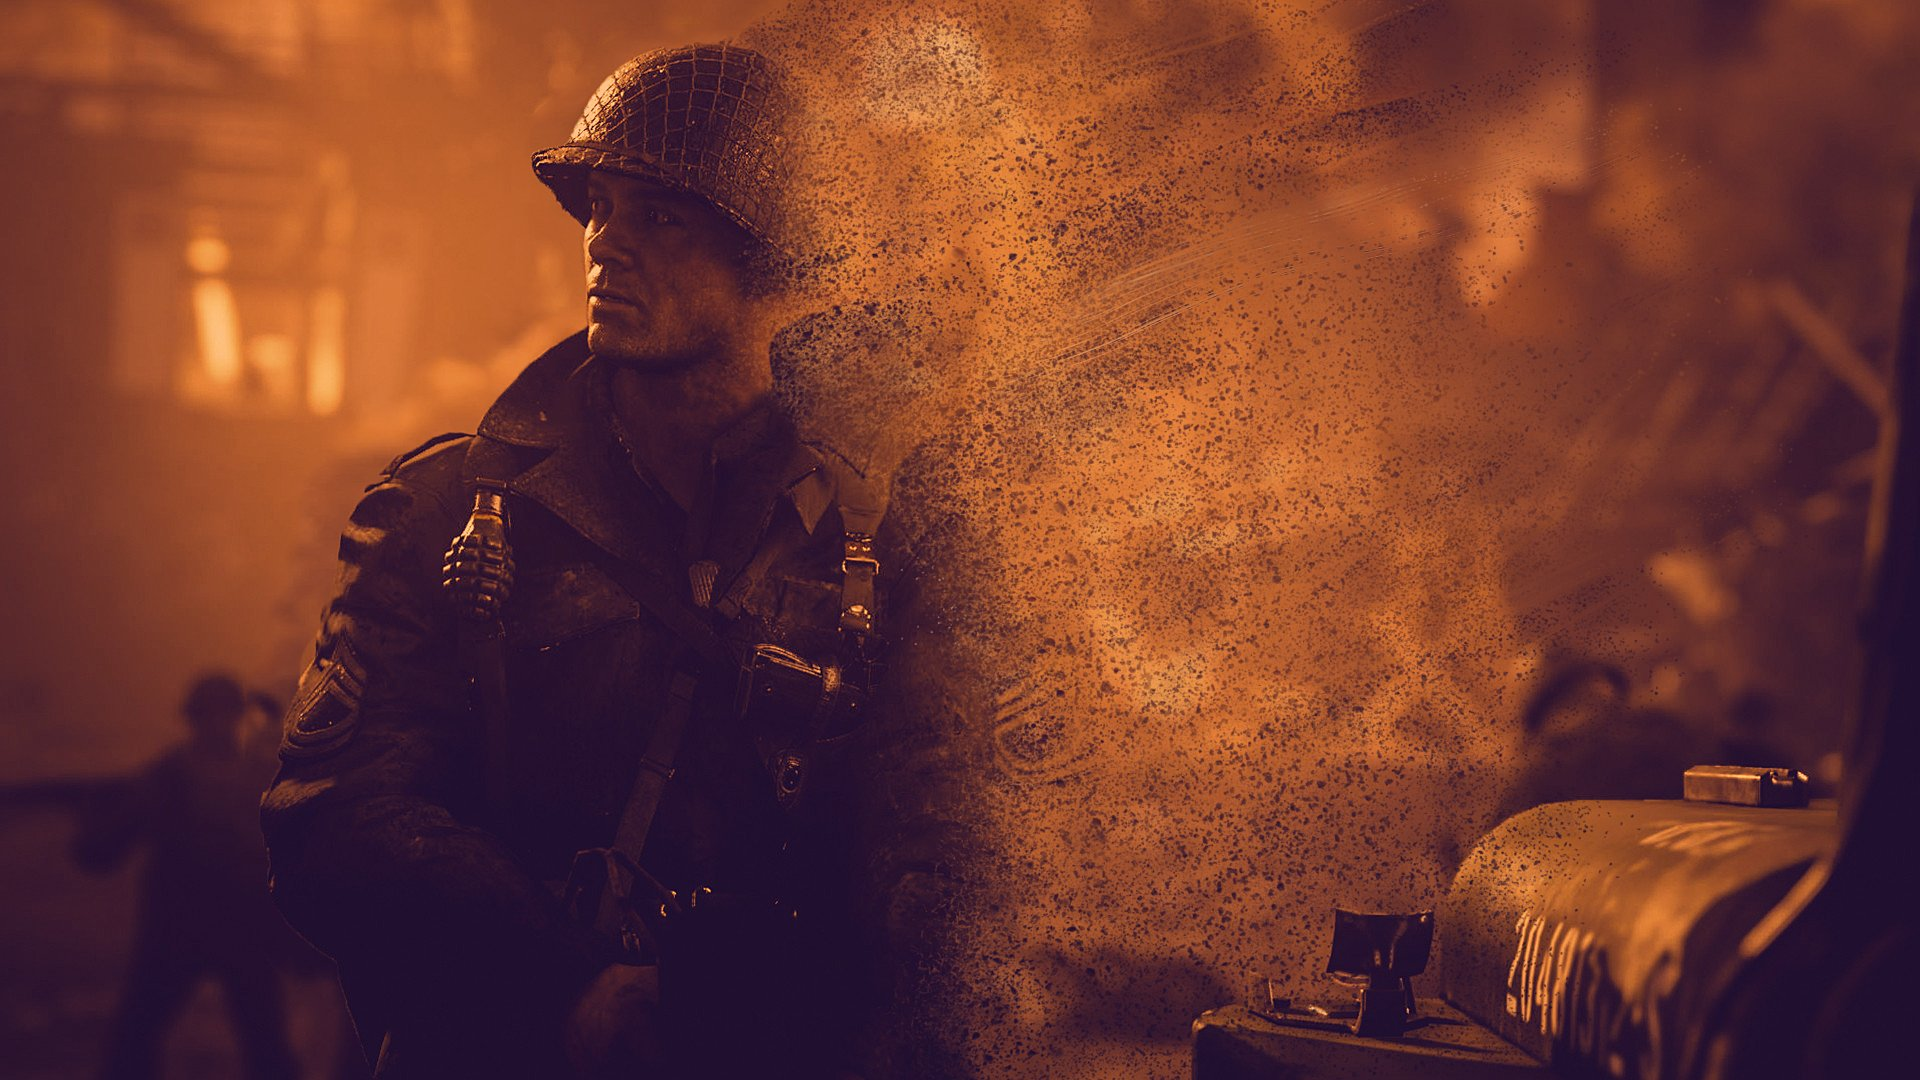 Call of duty wwii hd wallpaper background image - Call of duty ww2 desktop ...